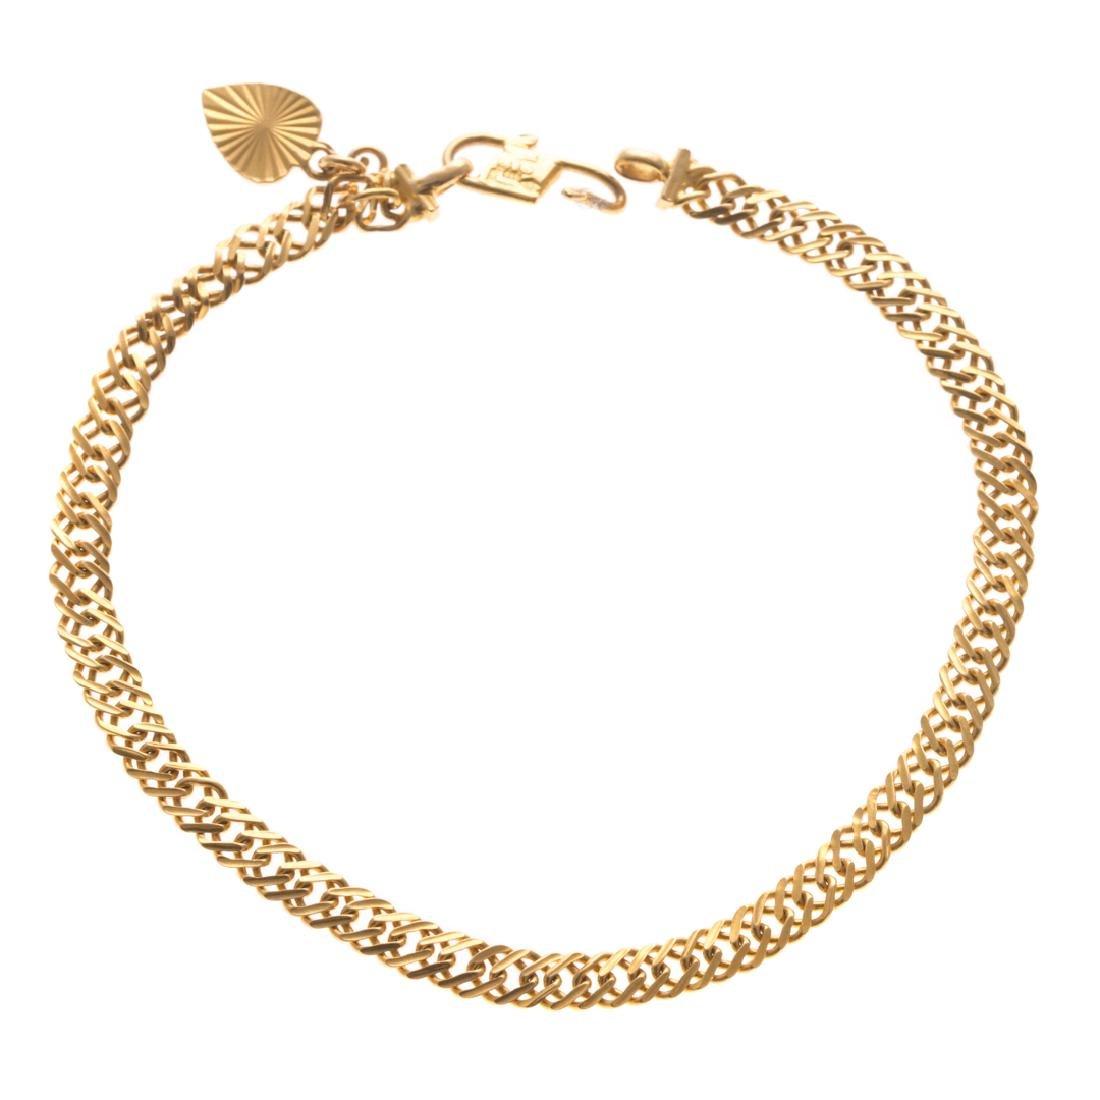 A Lady's 22K Flat Curbed Link Bracelet